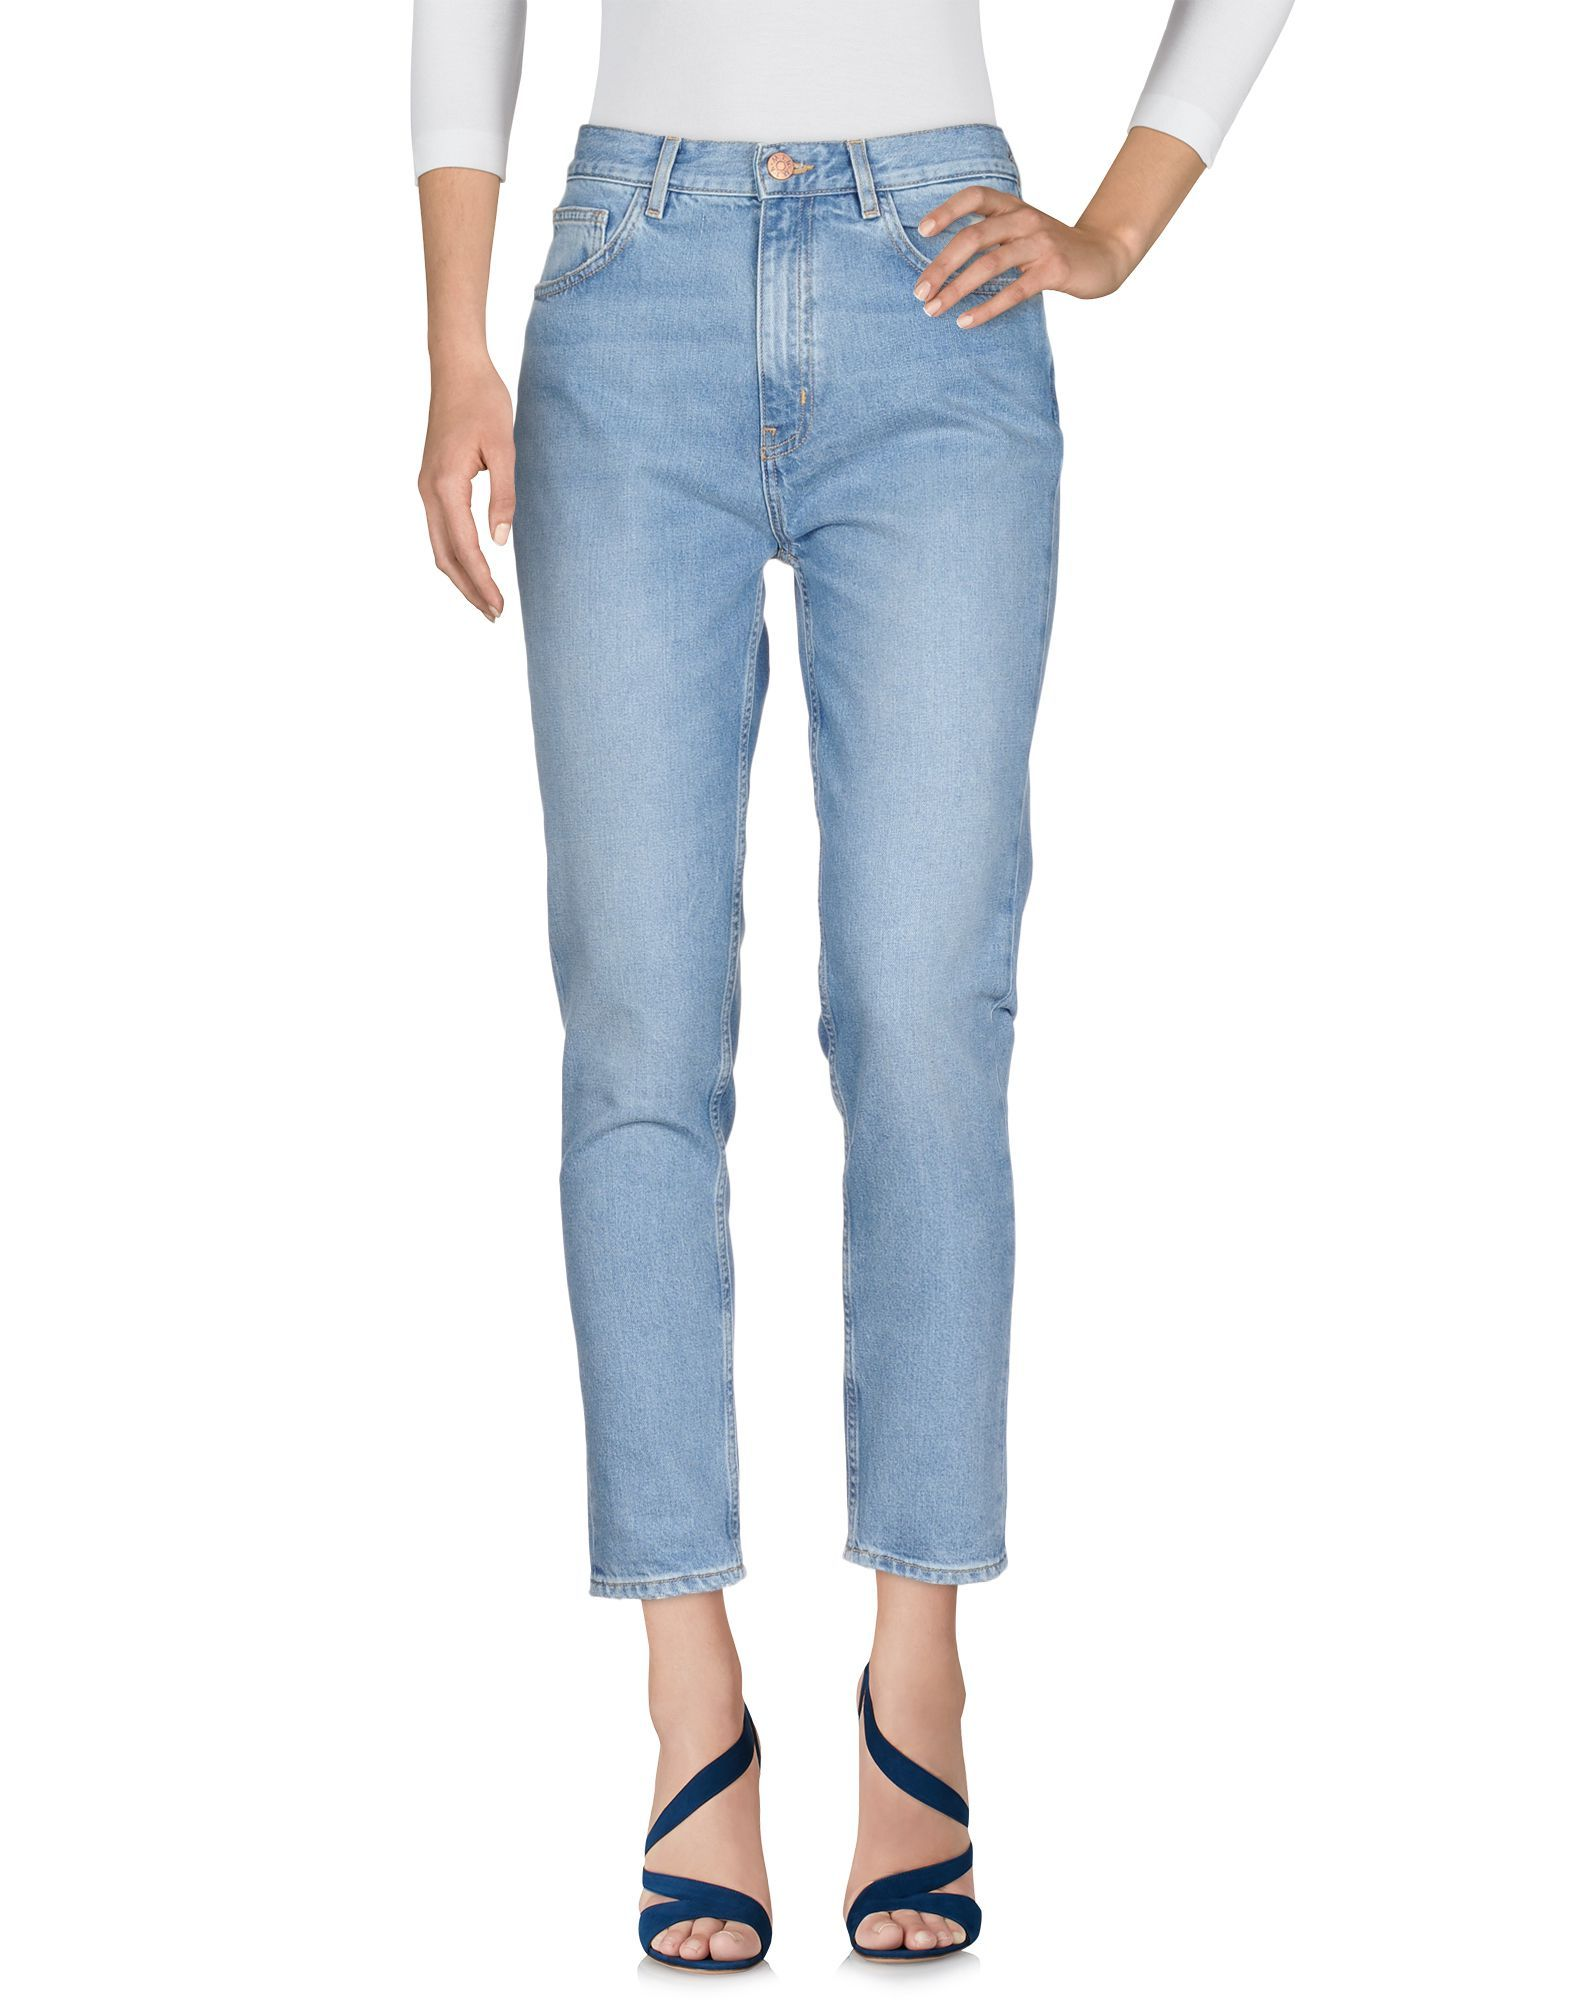 M.I.H Jeans Blue Cotton Cropped Jeans